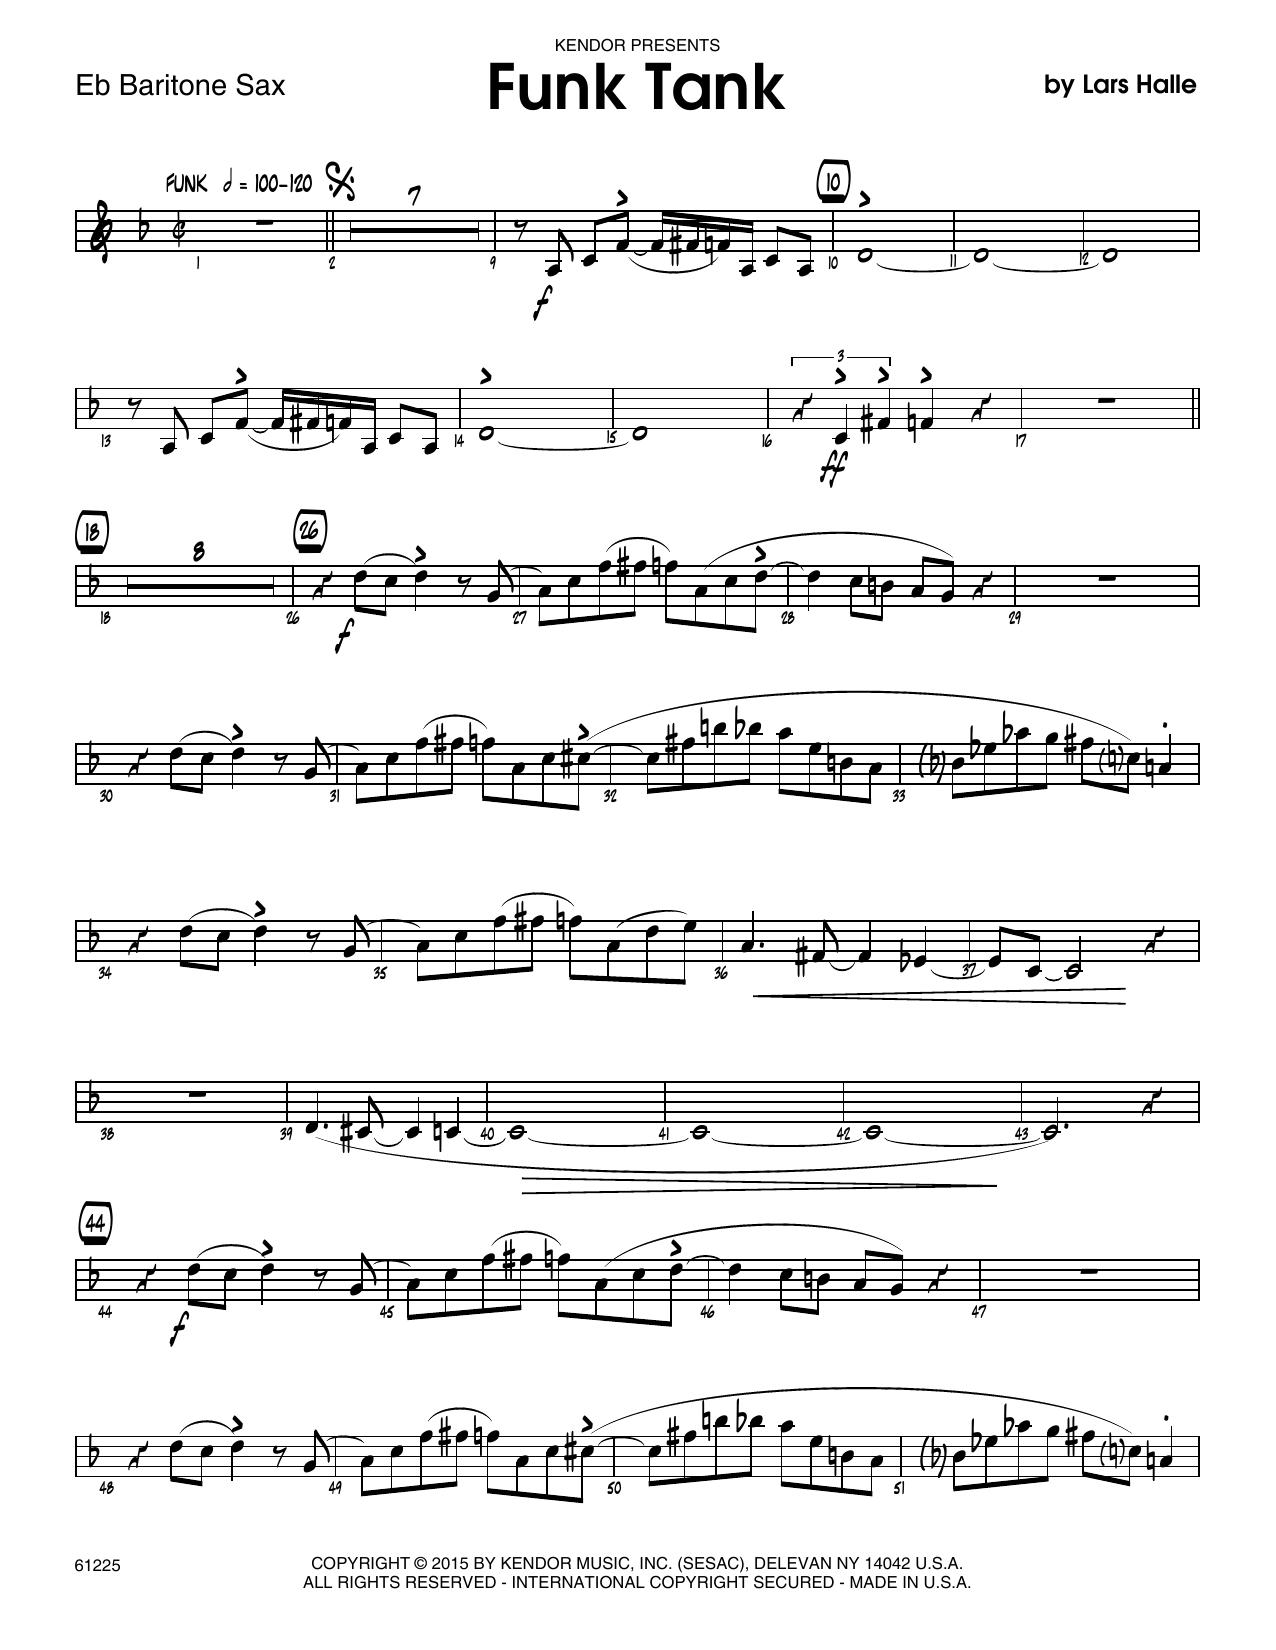 Funk Tank - Eb Baritone Saxophone Sheet Music